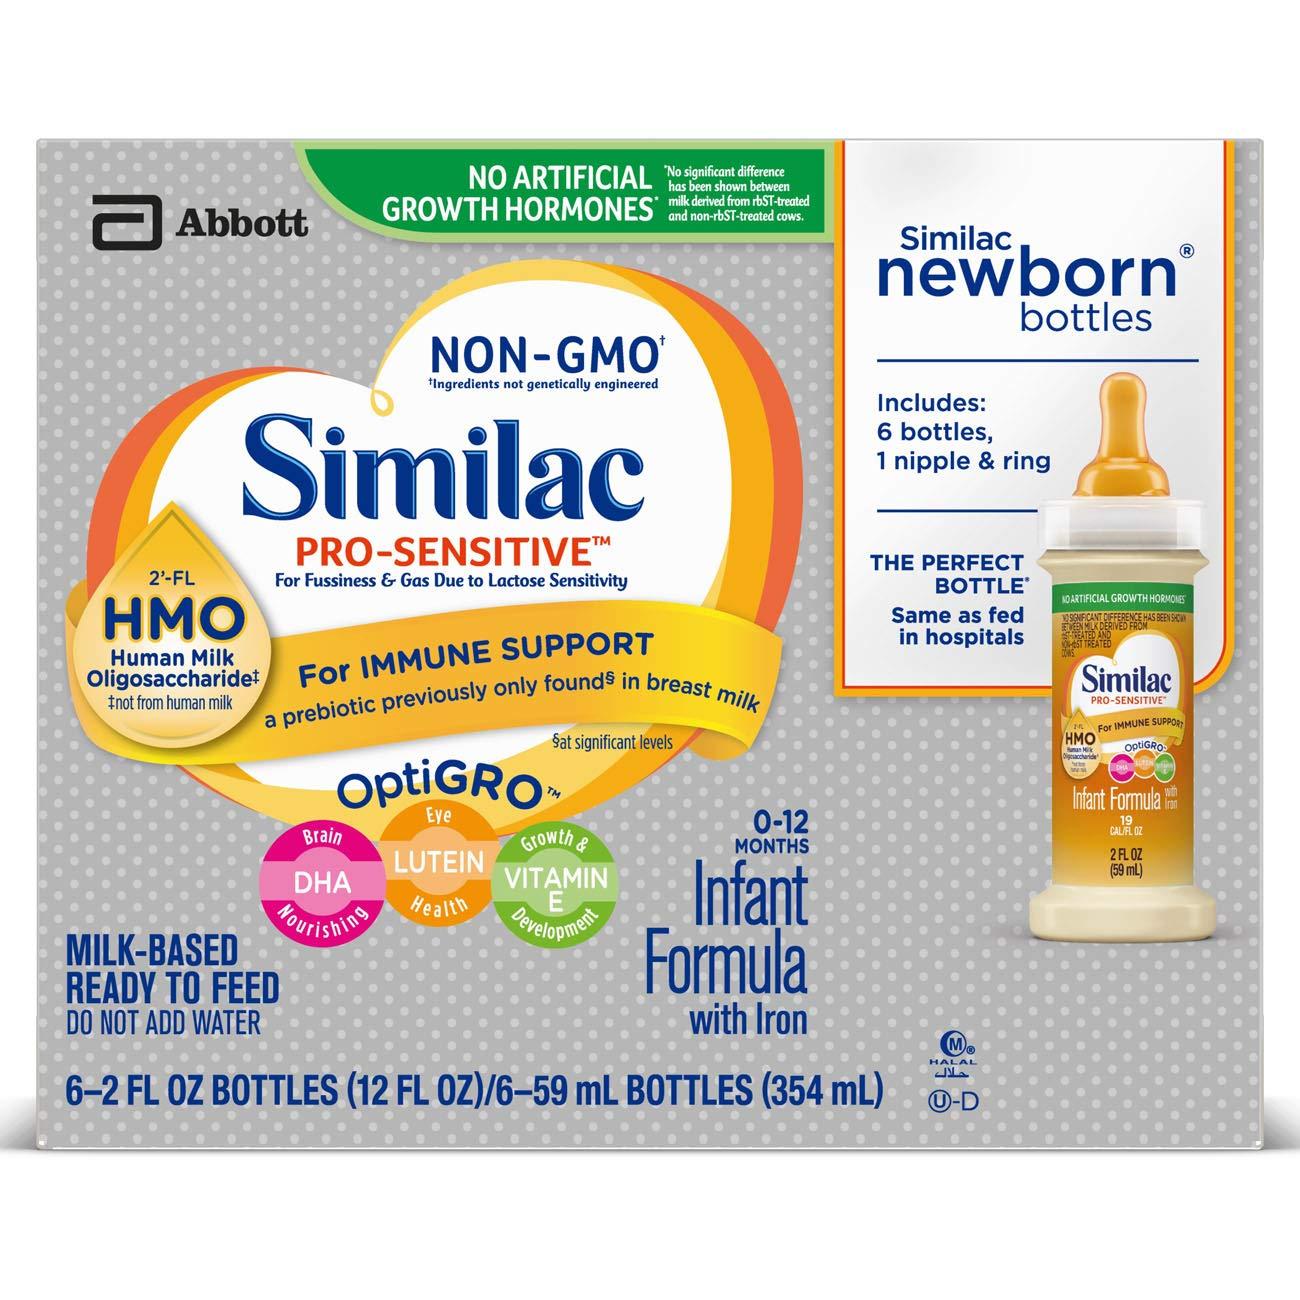 48-Count 2oz Similac Pro-Sensitive Infant Formula w/Iron $29.63 5% or $24.24 15% AC w/s&s + Free Shipping